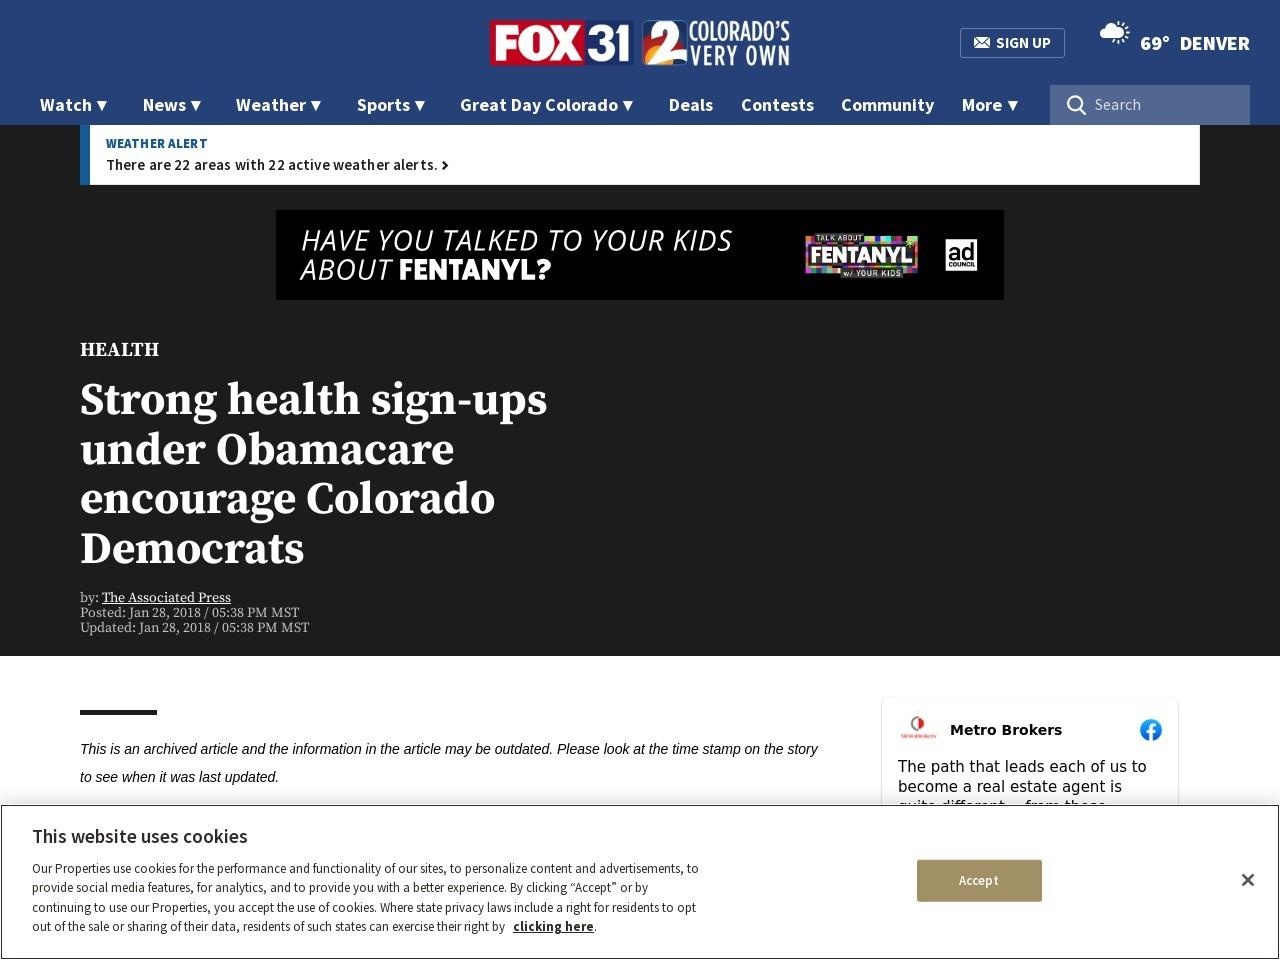 Strong health sign-ups under Obamacare encourage Colorado Democrats